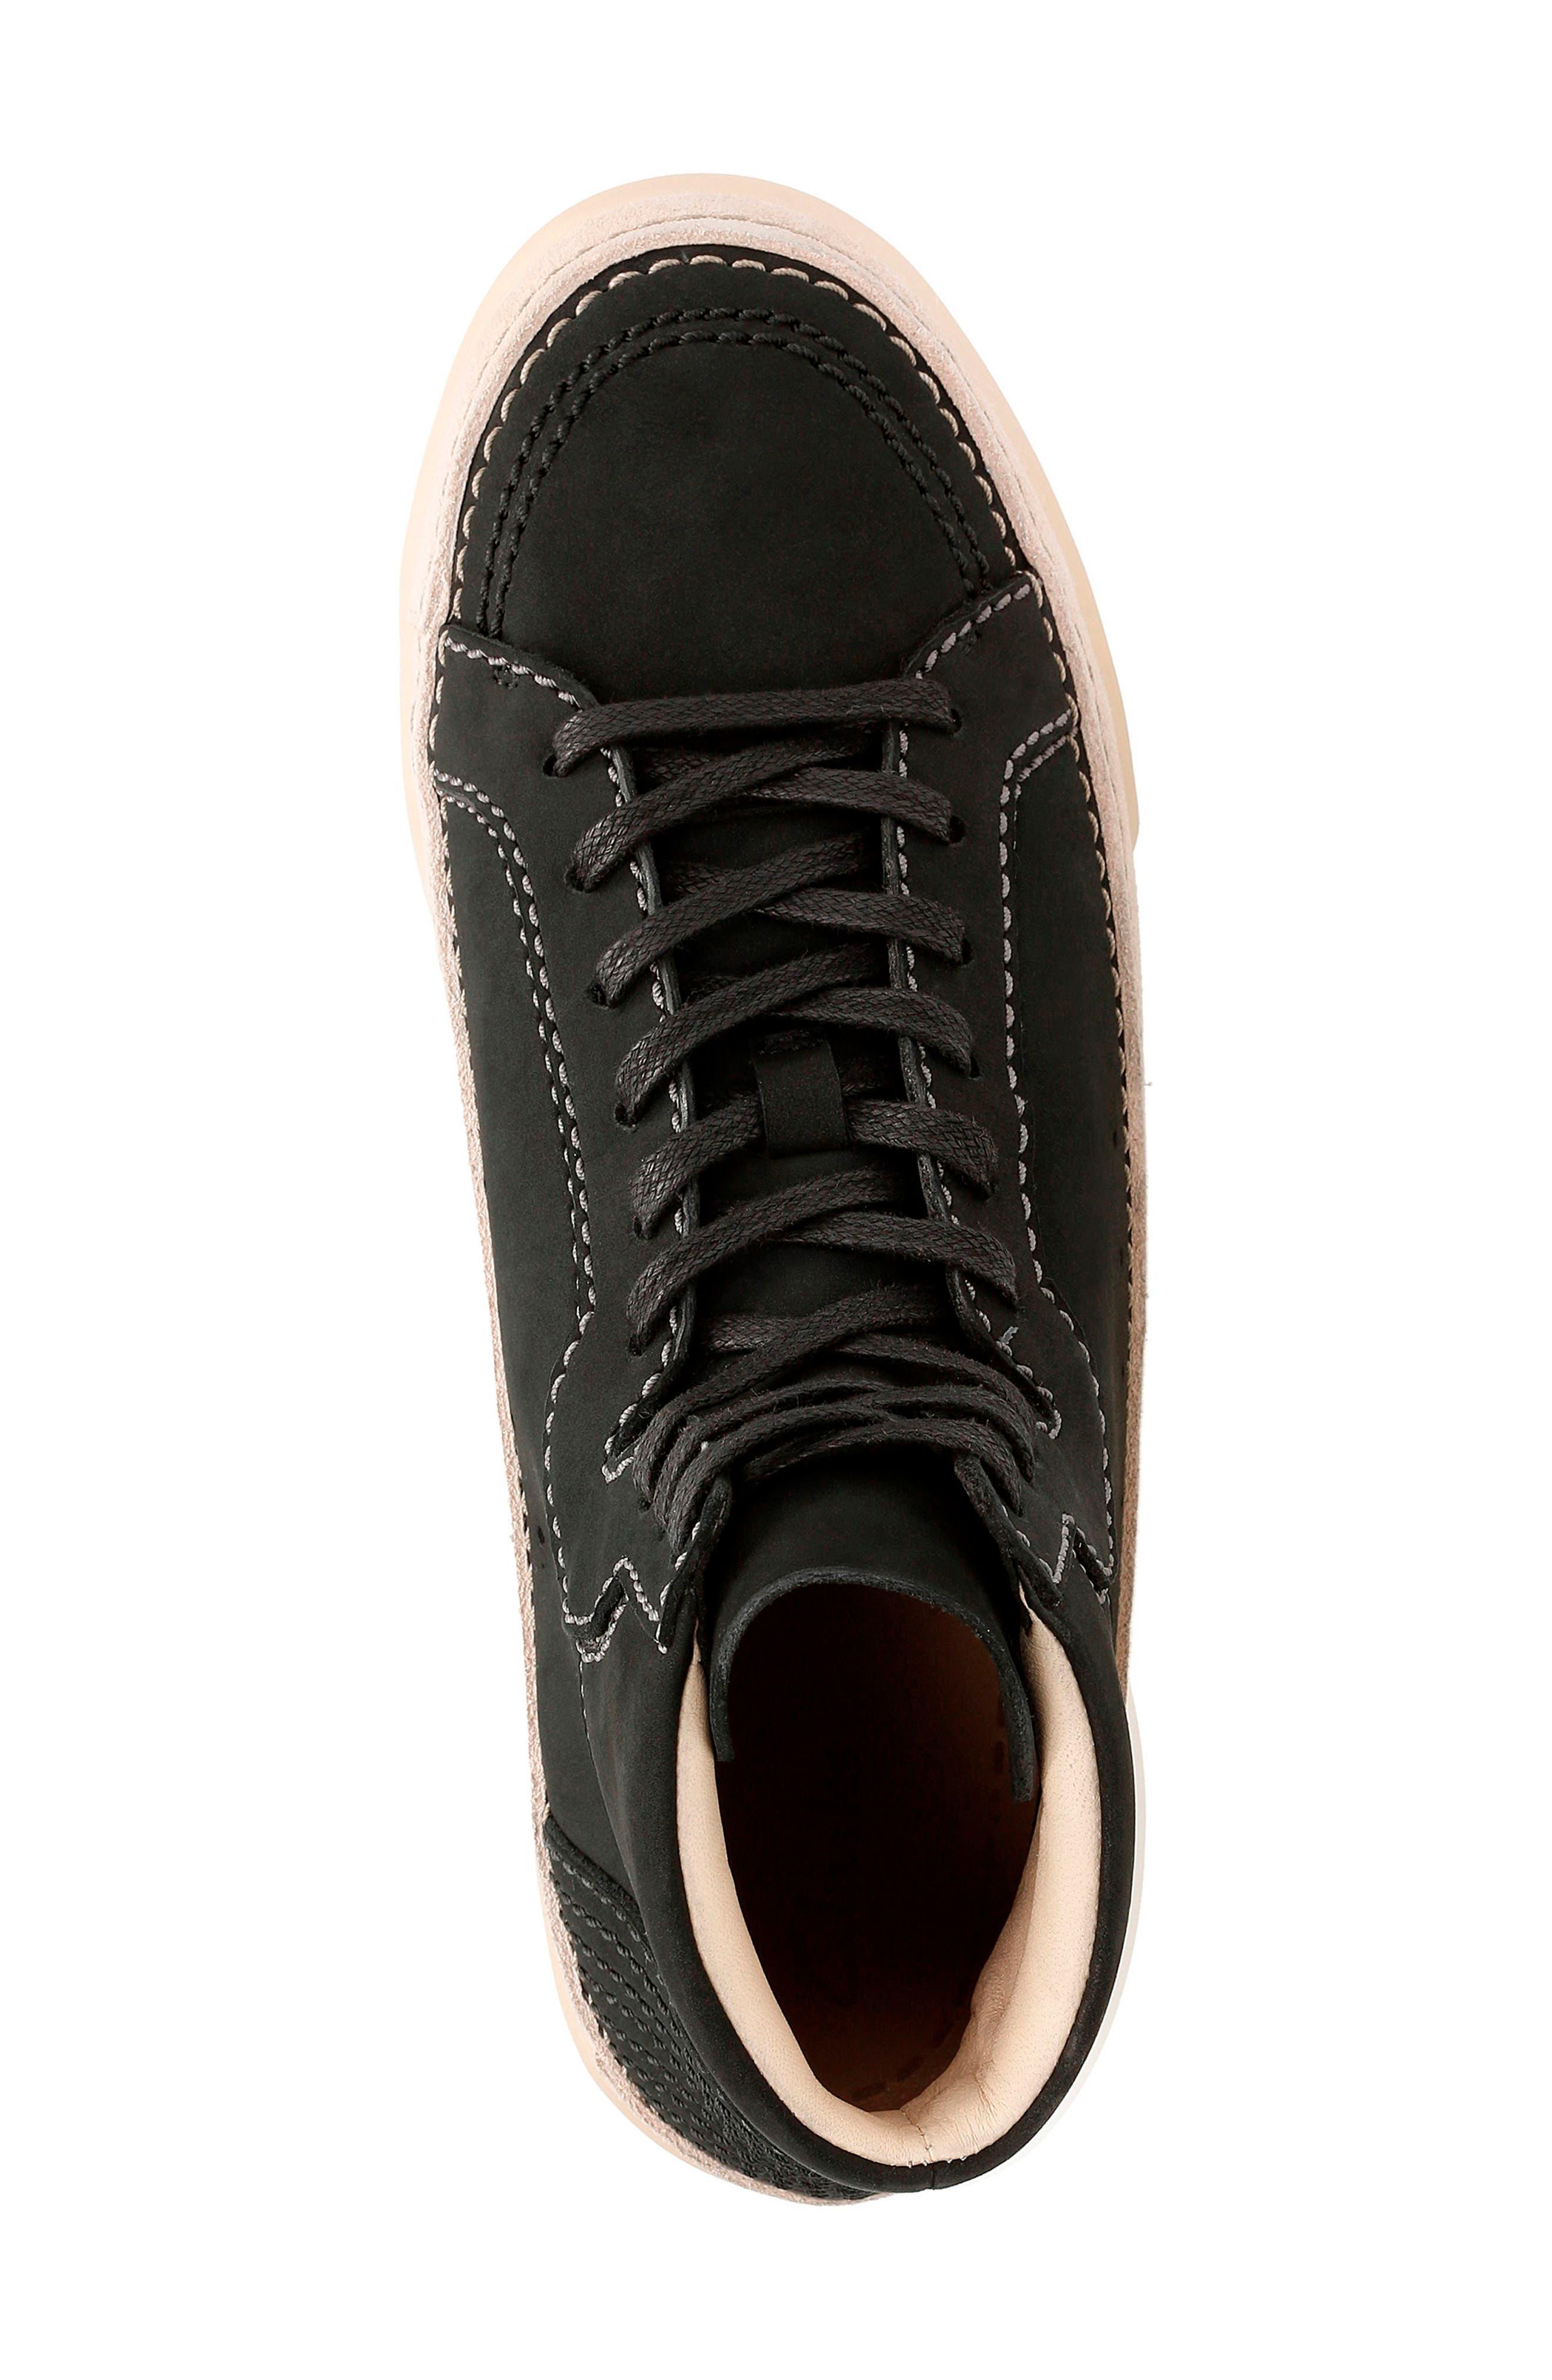 Hidi Haze High Top Sneaker,                             Alternate thumbnail 7, color,